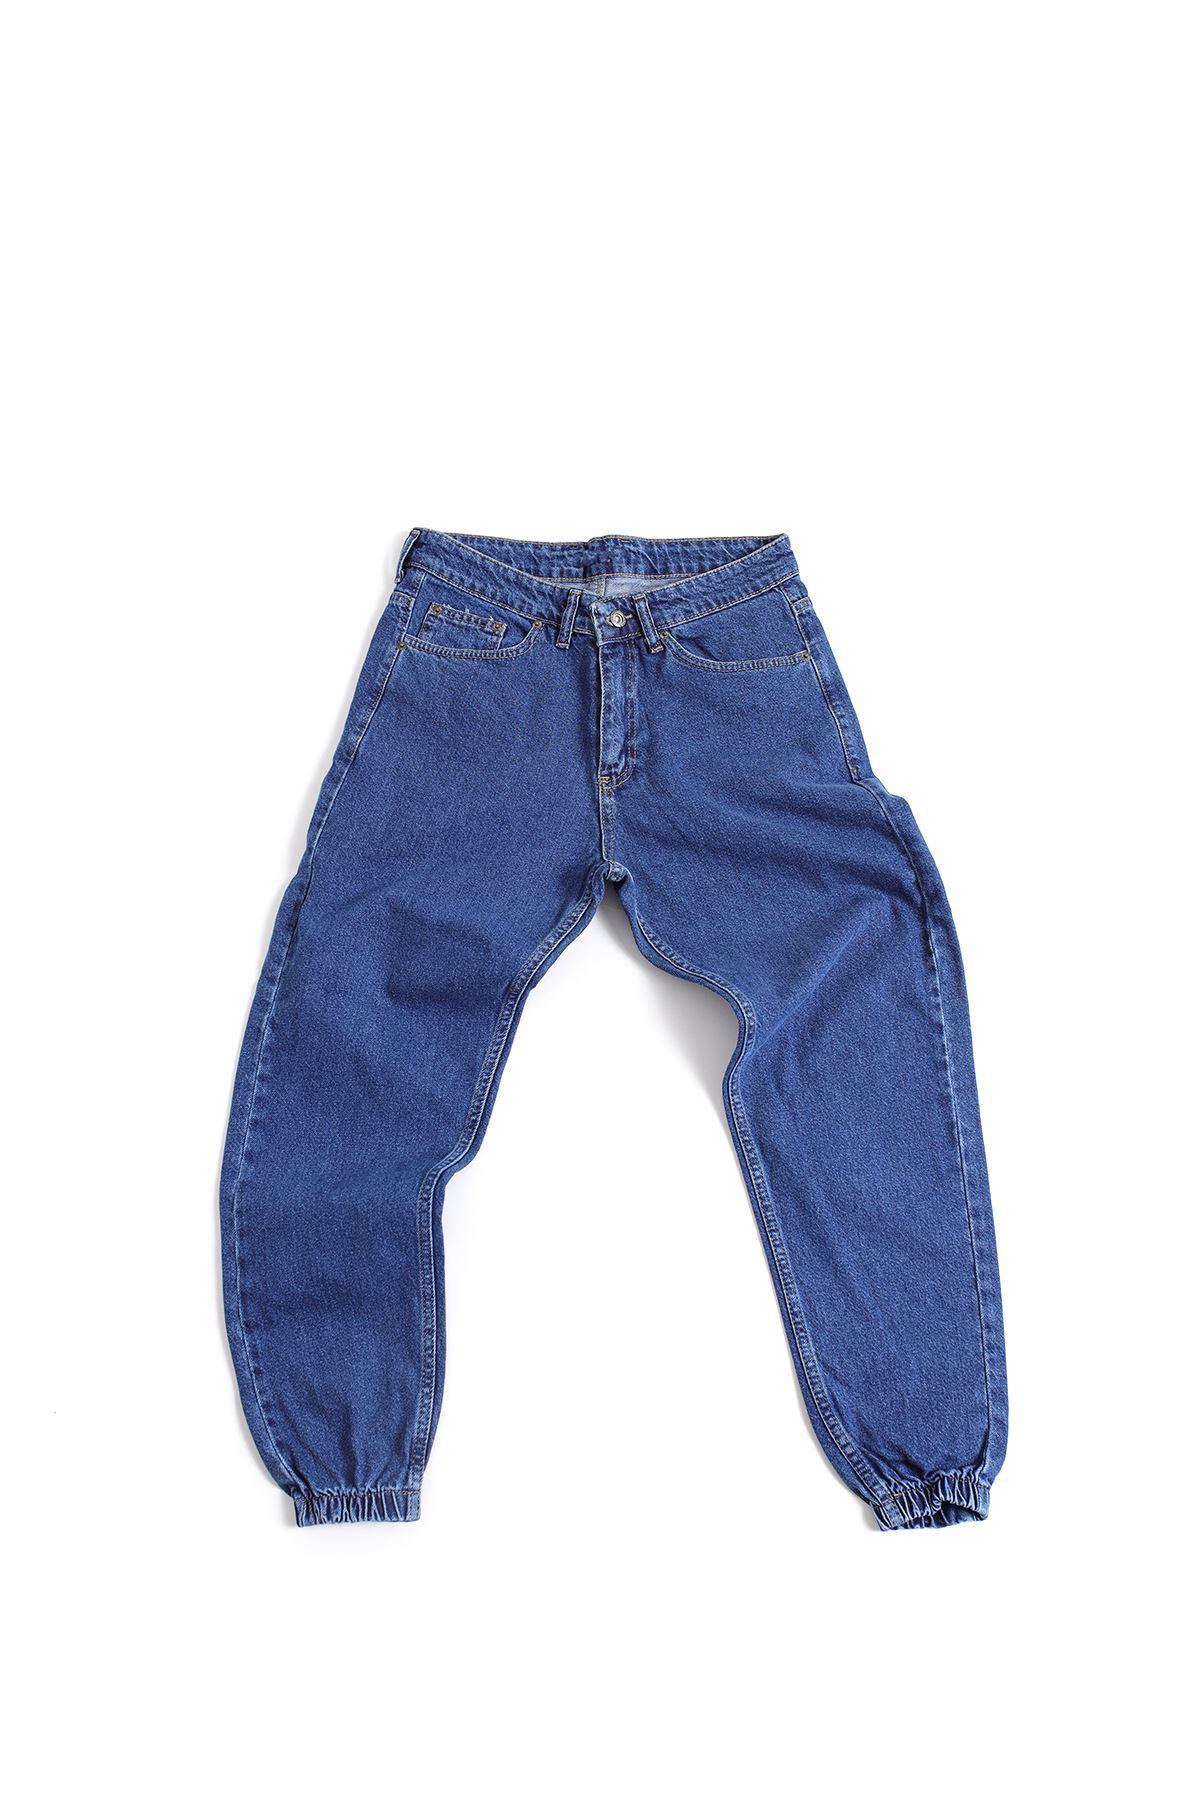 Koyu Mavi Boyfriend Kot Pantolon